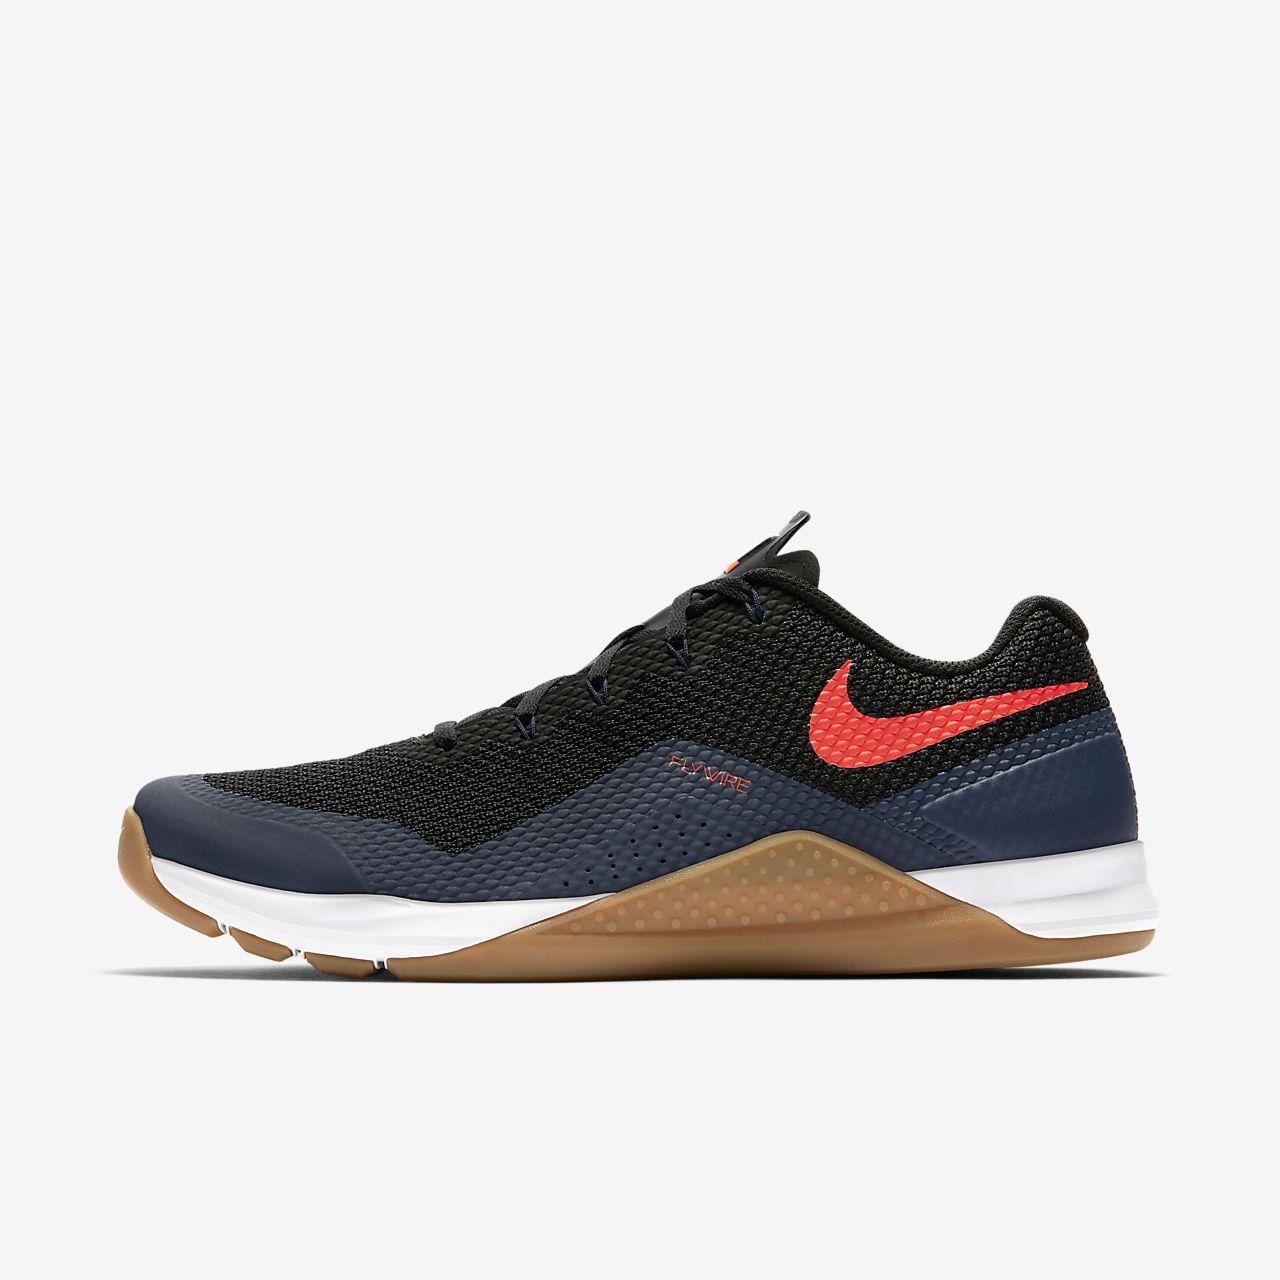 Nike Training Men / Blue/Black Model:299